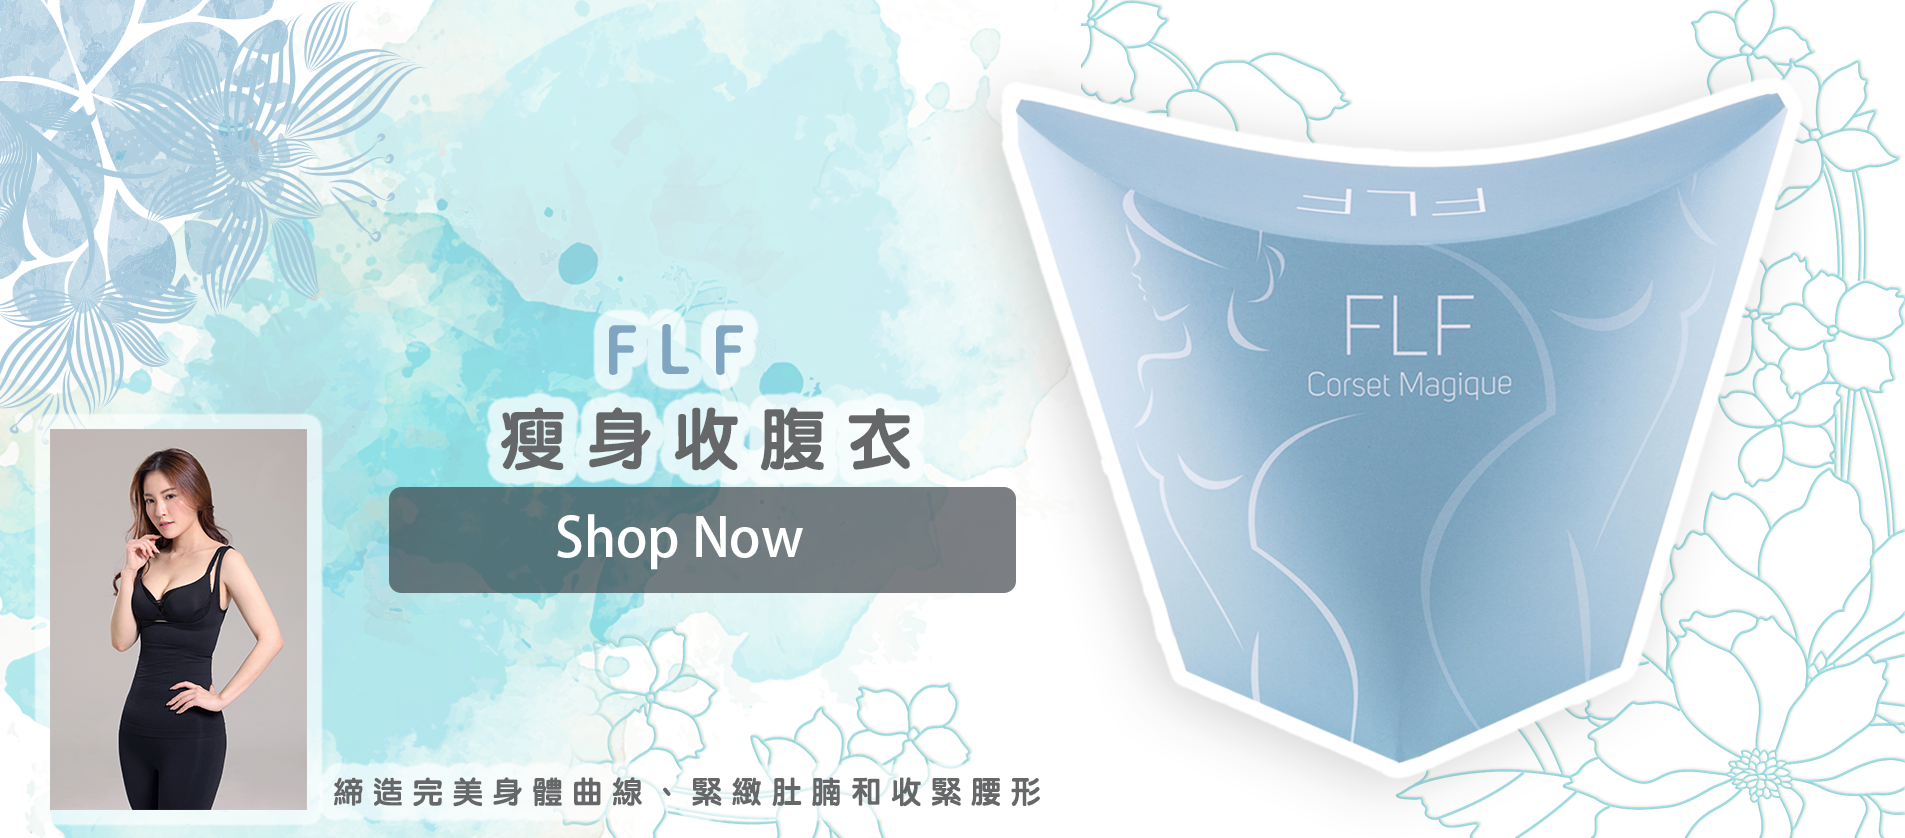 FLF 塑身束衣